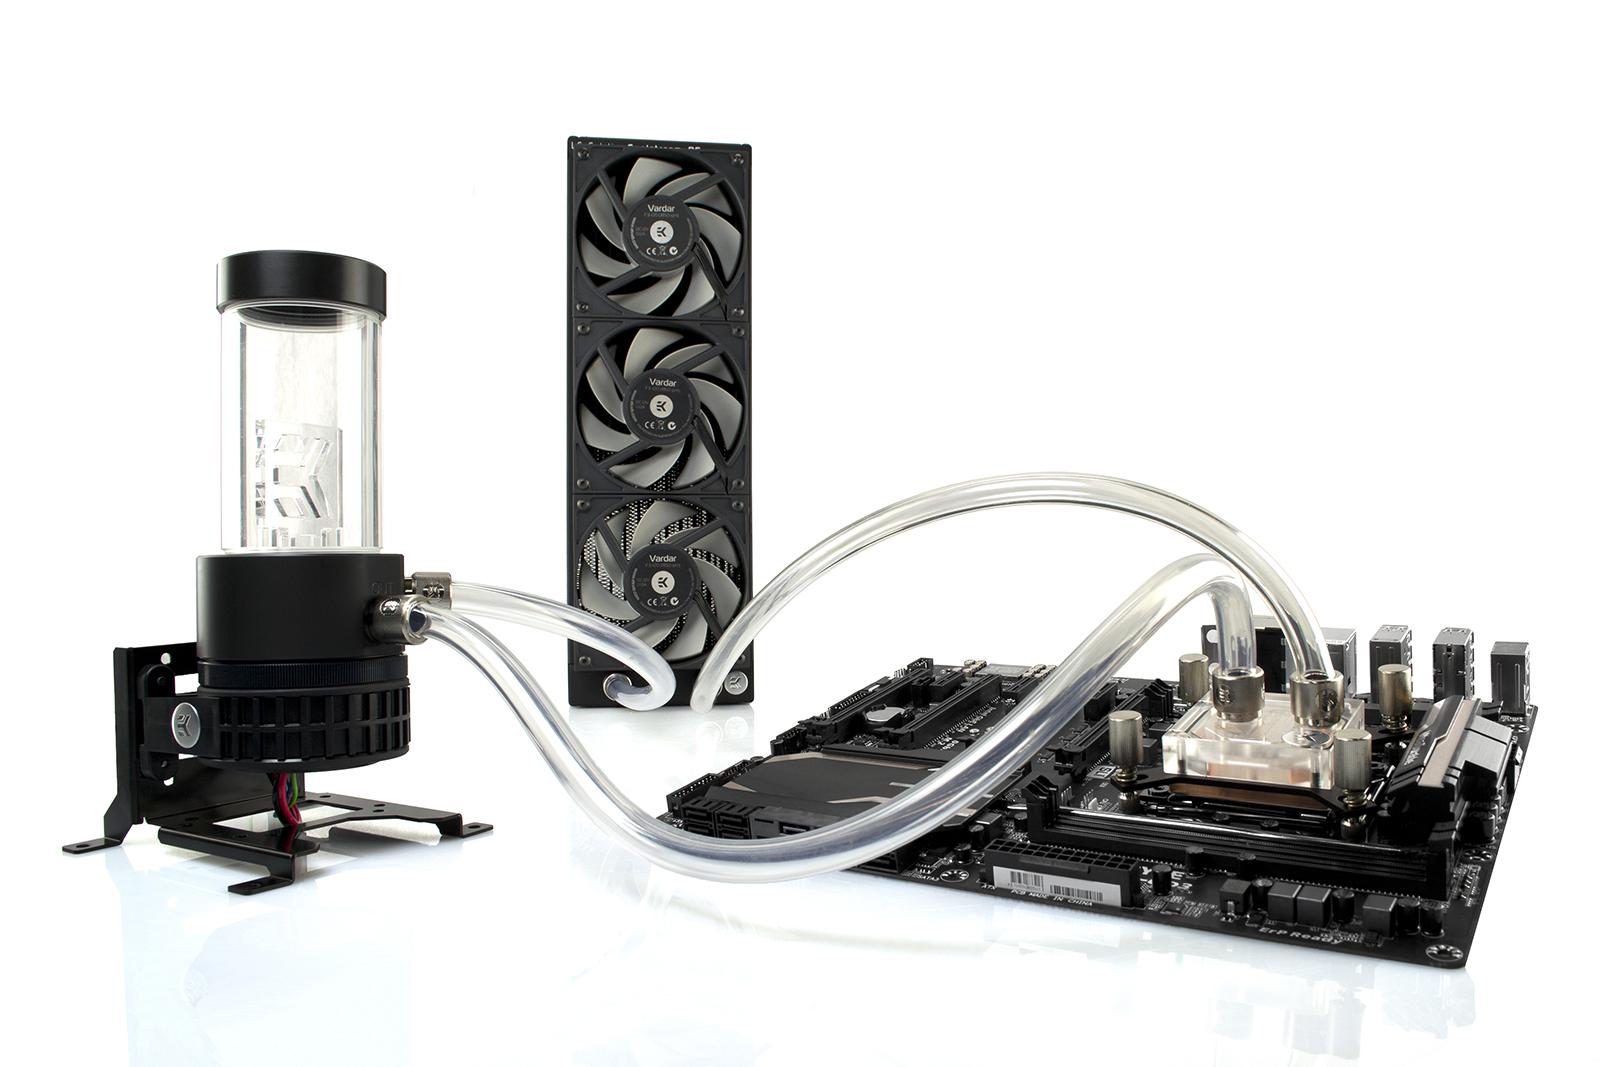 How to choose the right liquid cooling kit? ekwb.com #736658